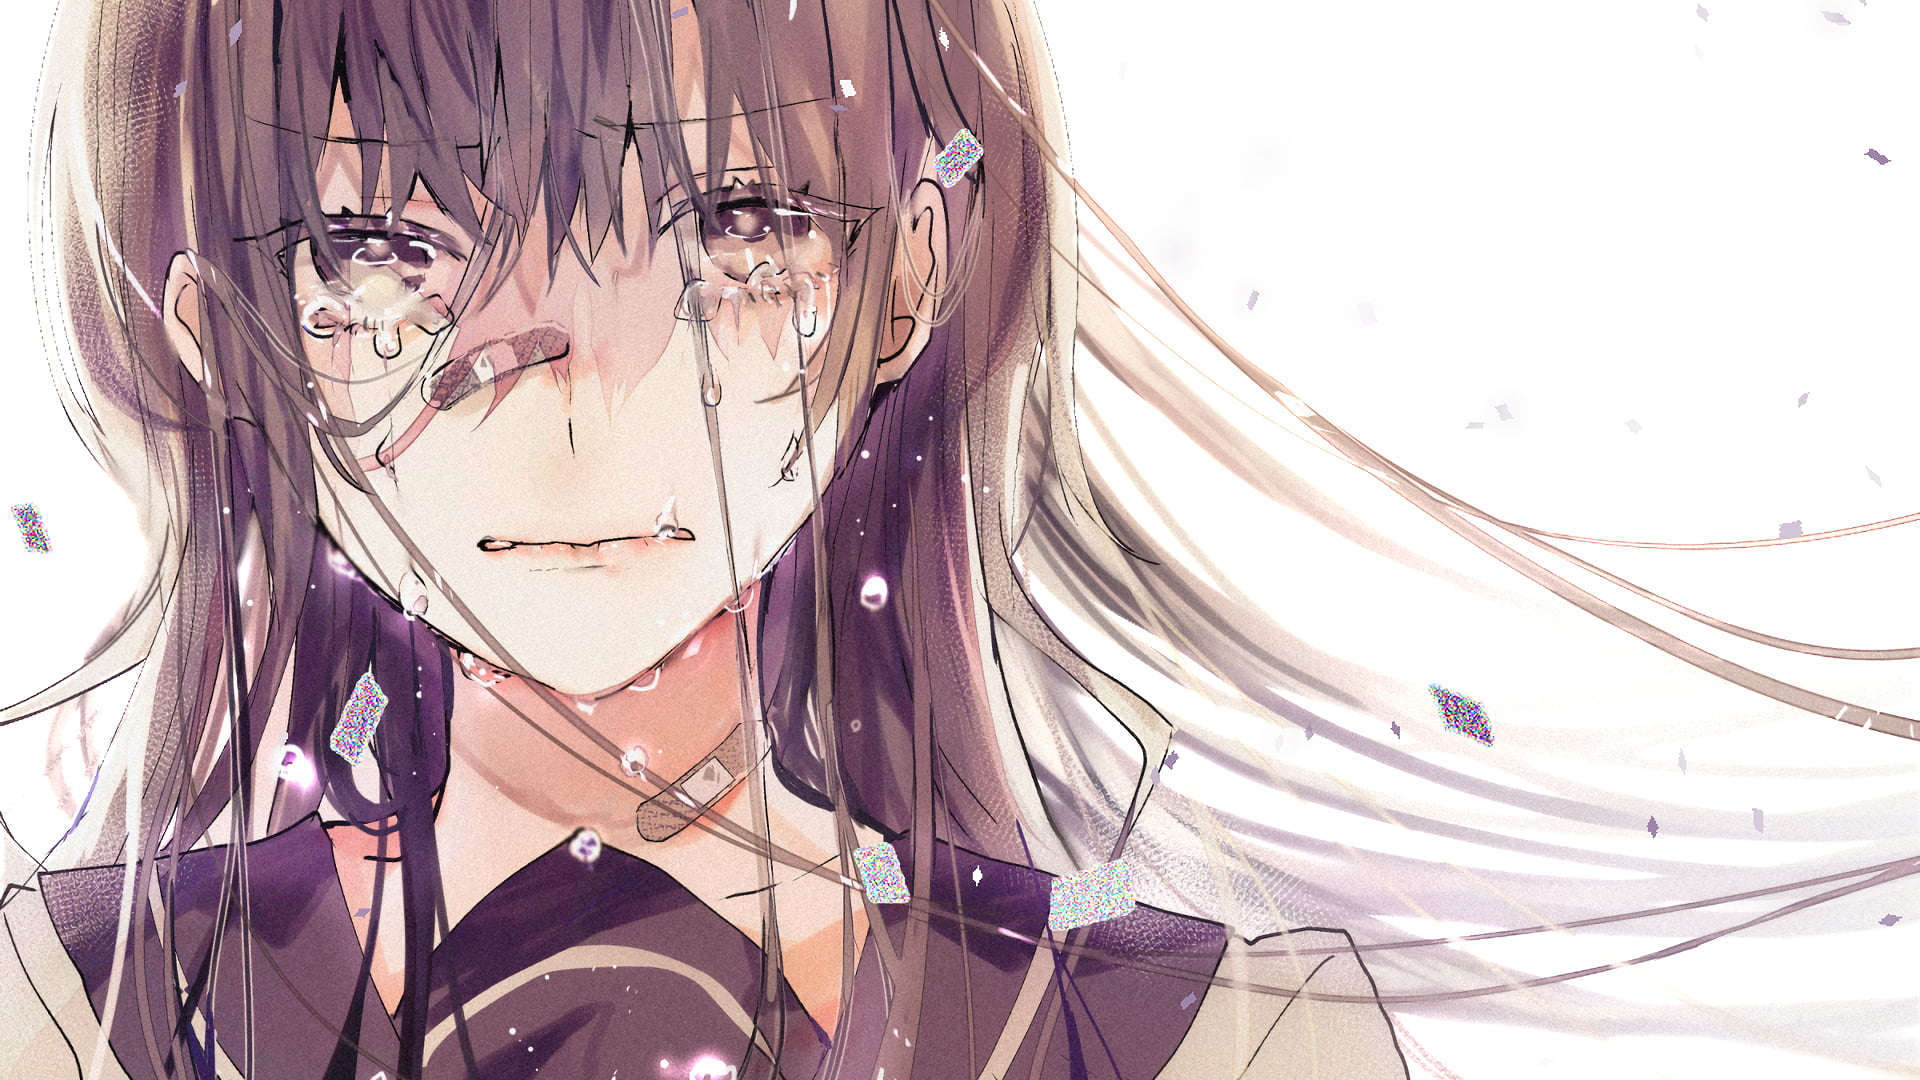 Anime girl sedih wallpaper